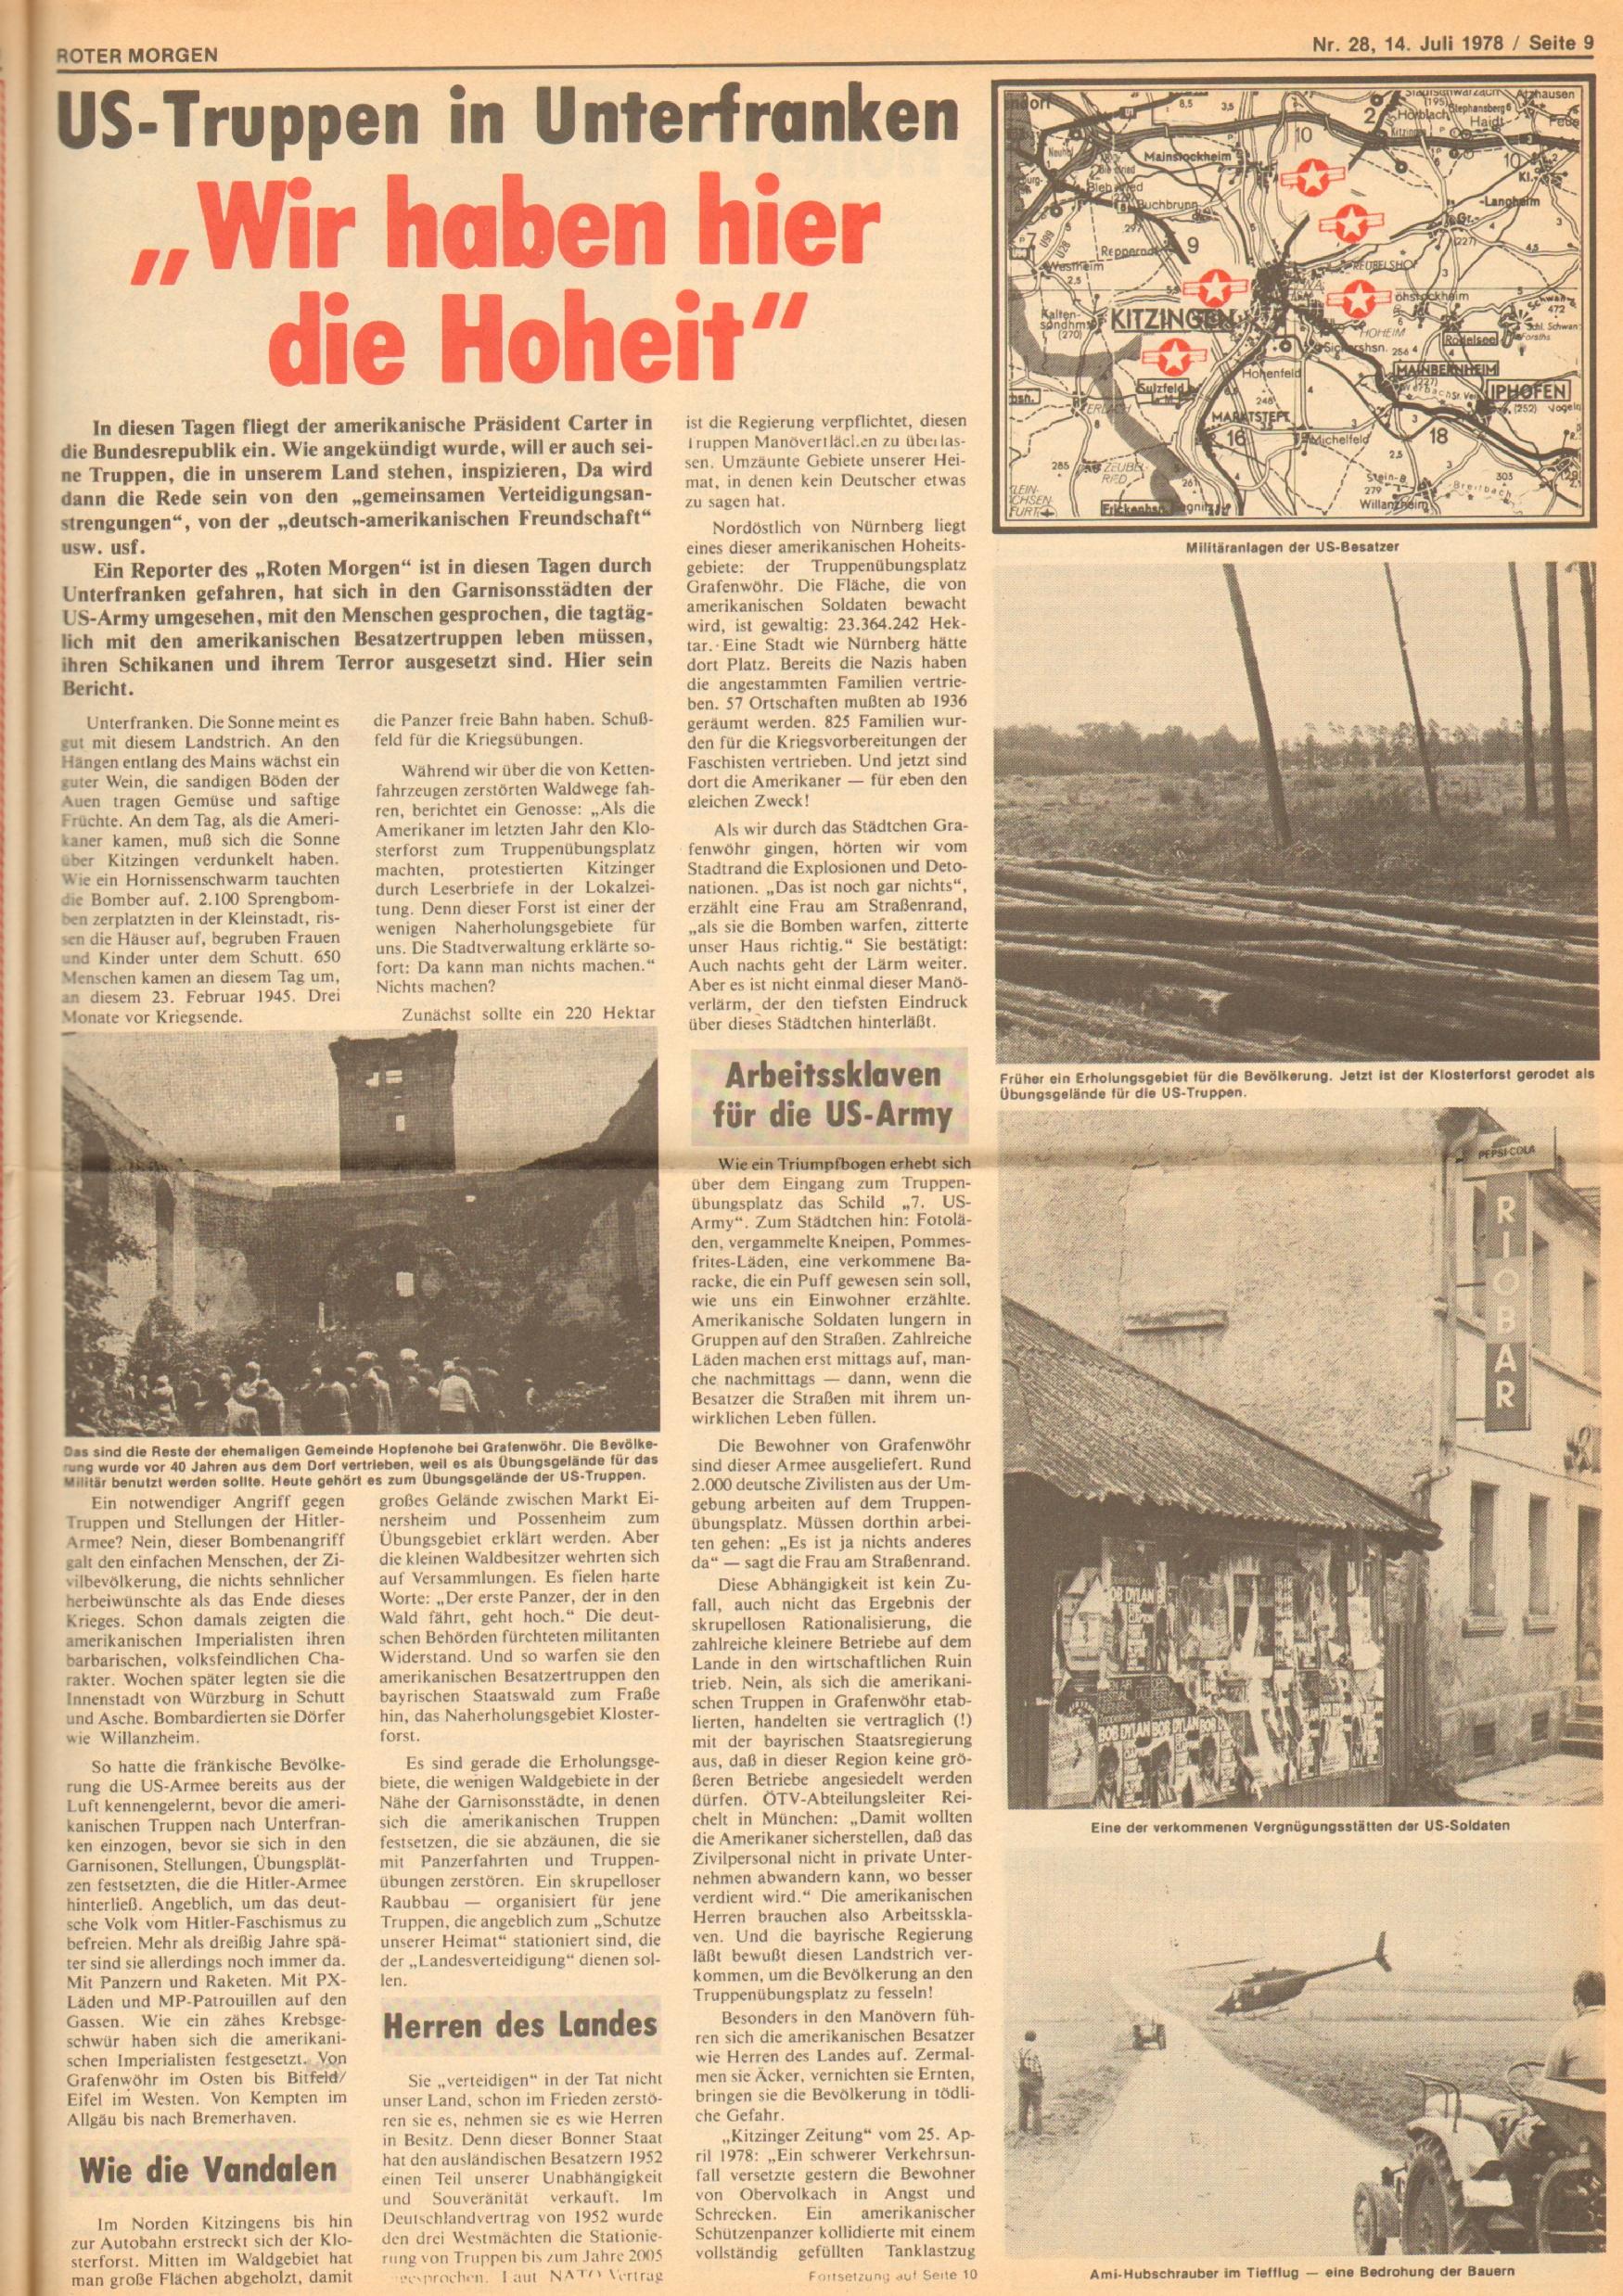 Roter Morgen, 12. Jg., 16. Juli 1978, Nr. 28, Seite 9